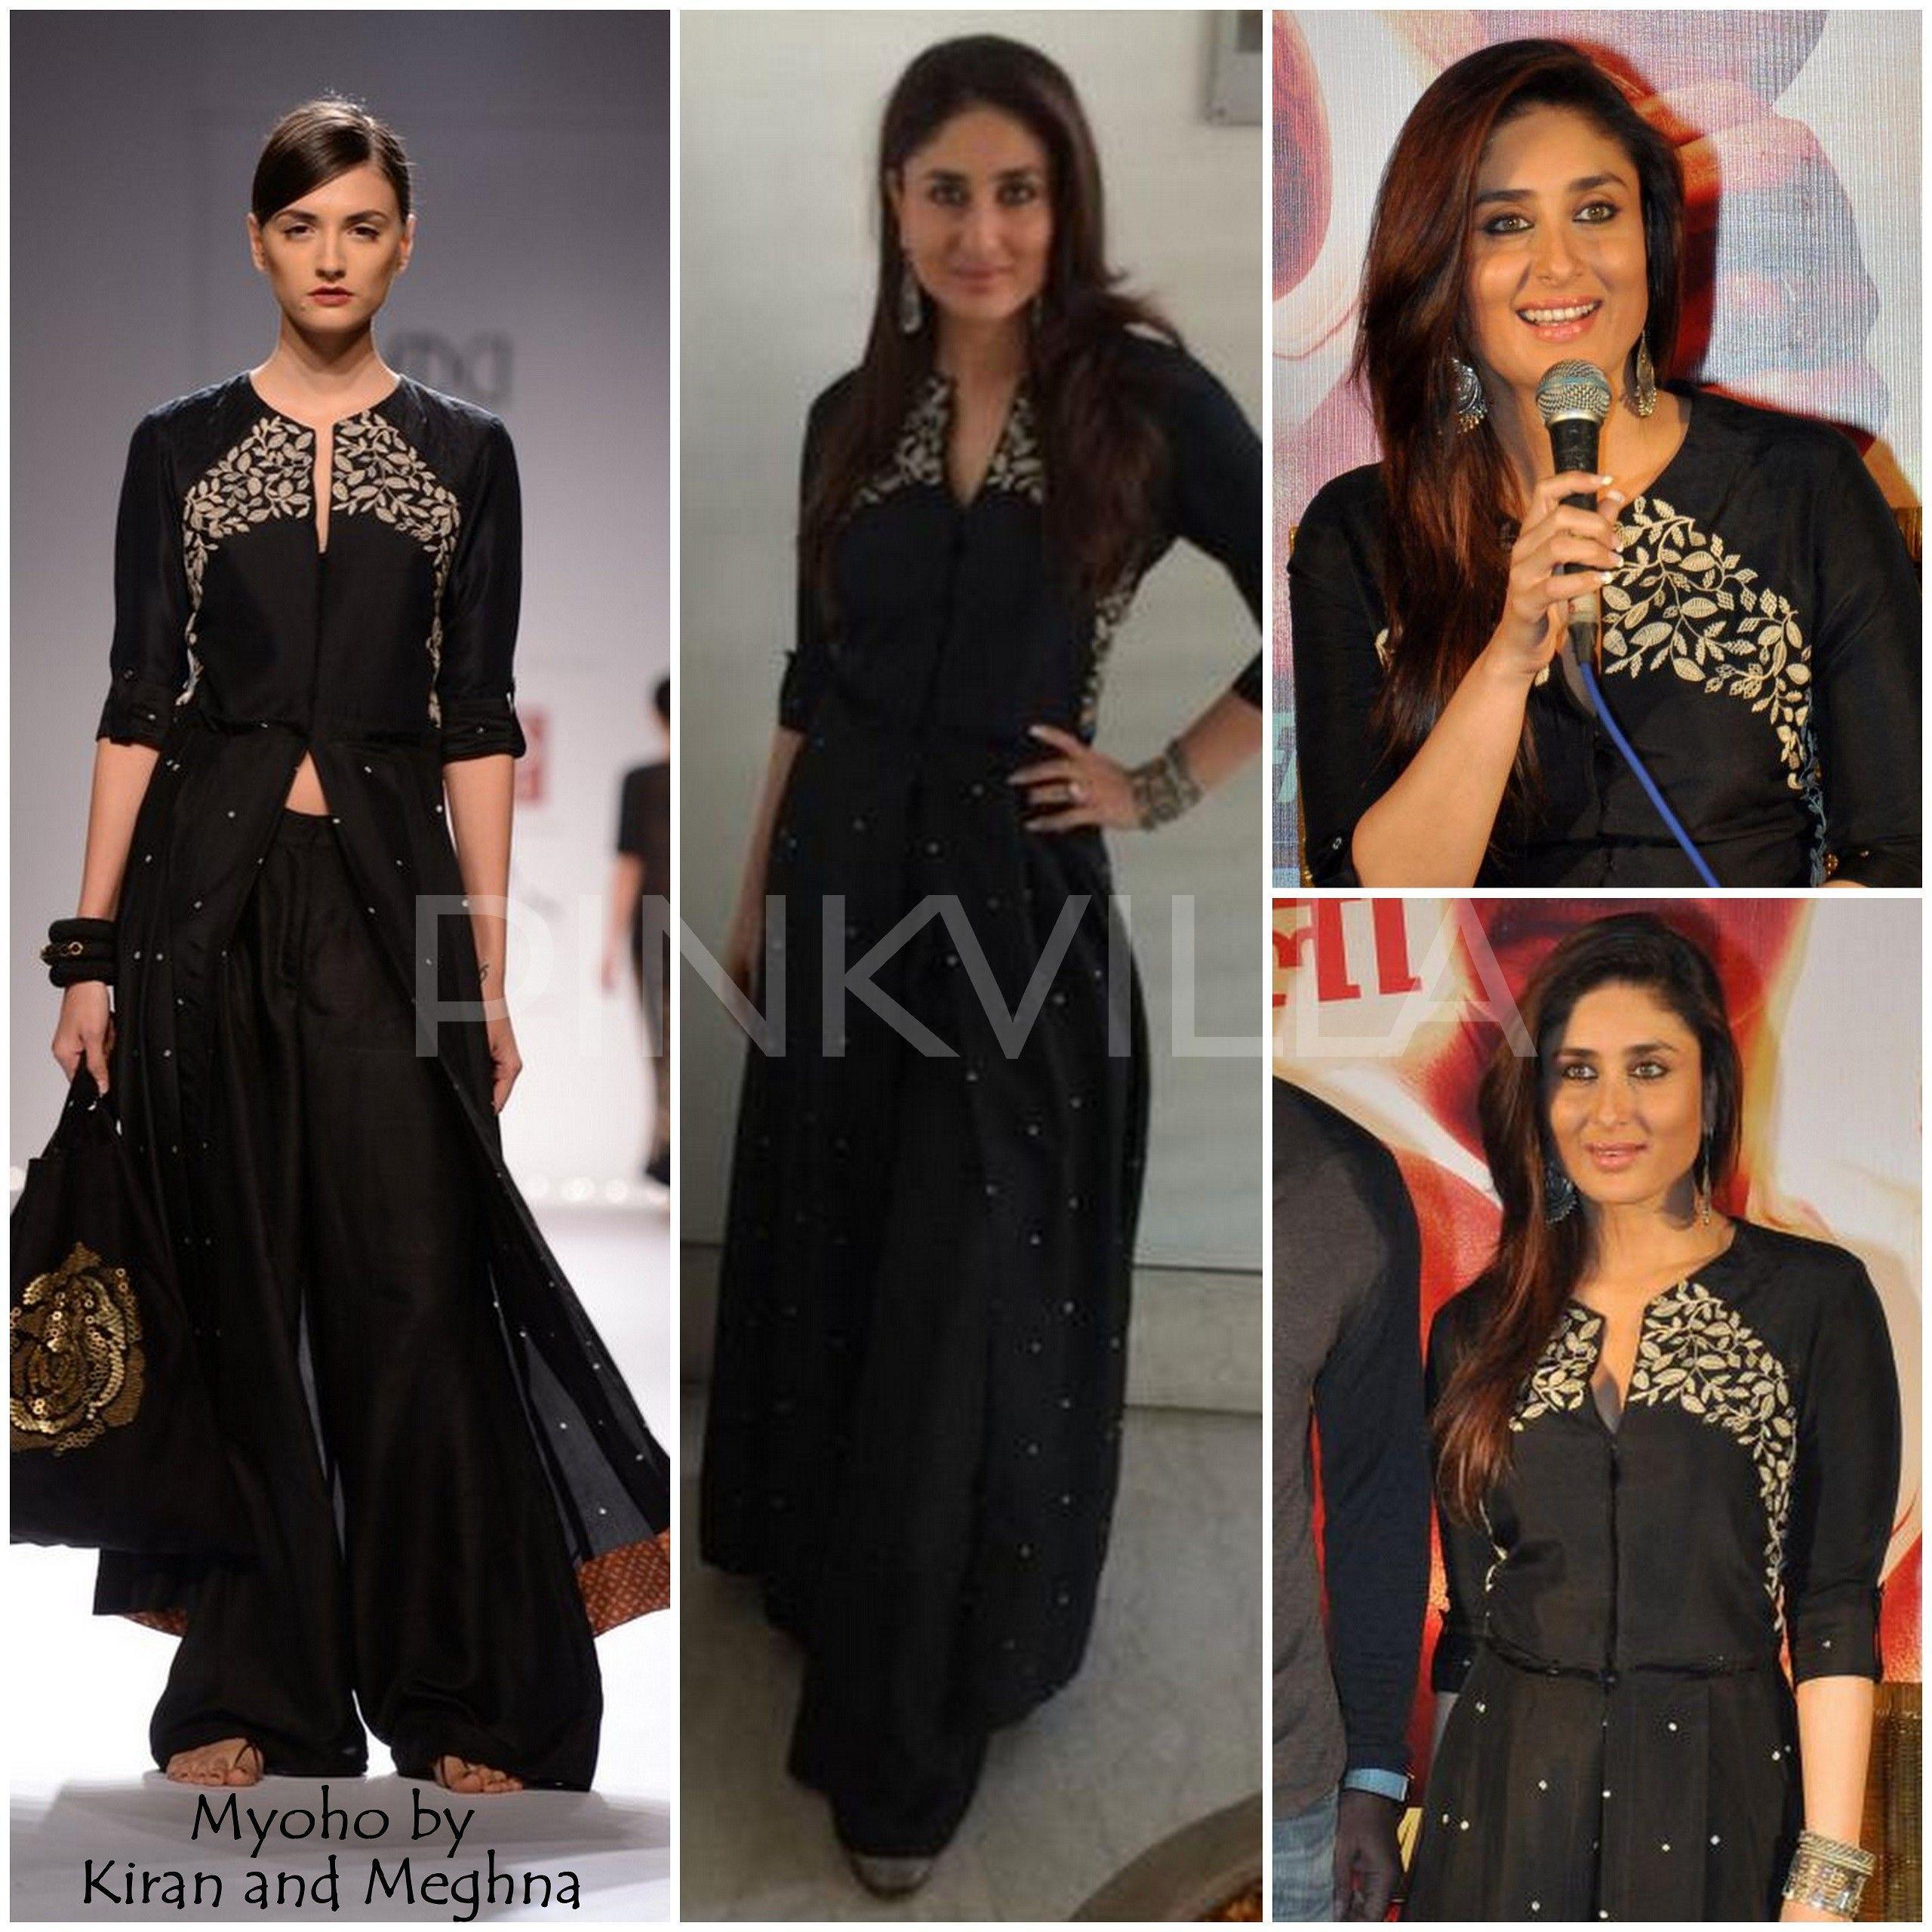 Black dress kareena kapoor - Yay Or Nay Kareena Kapoor In Myoho By Kiran And Meghna